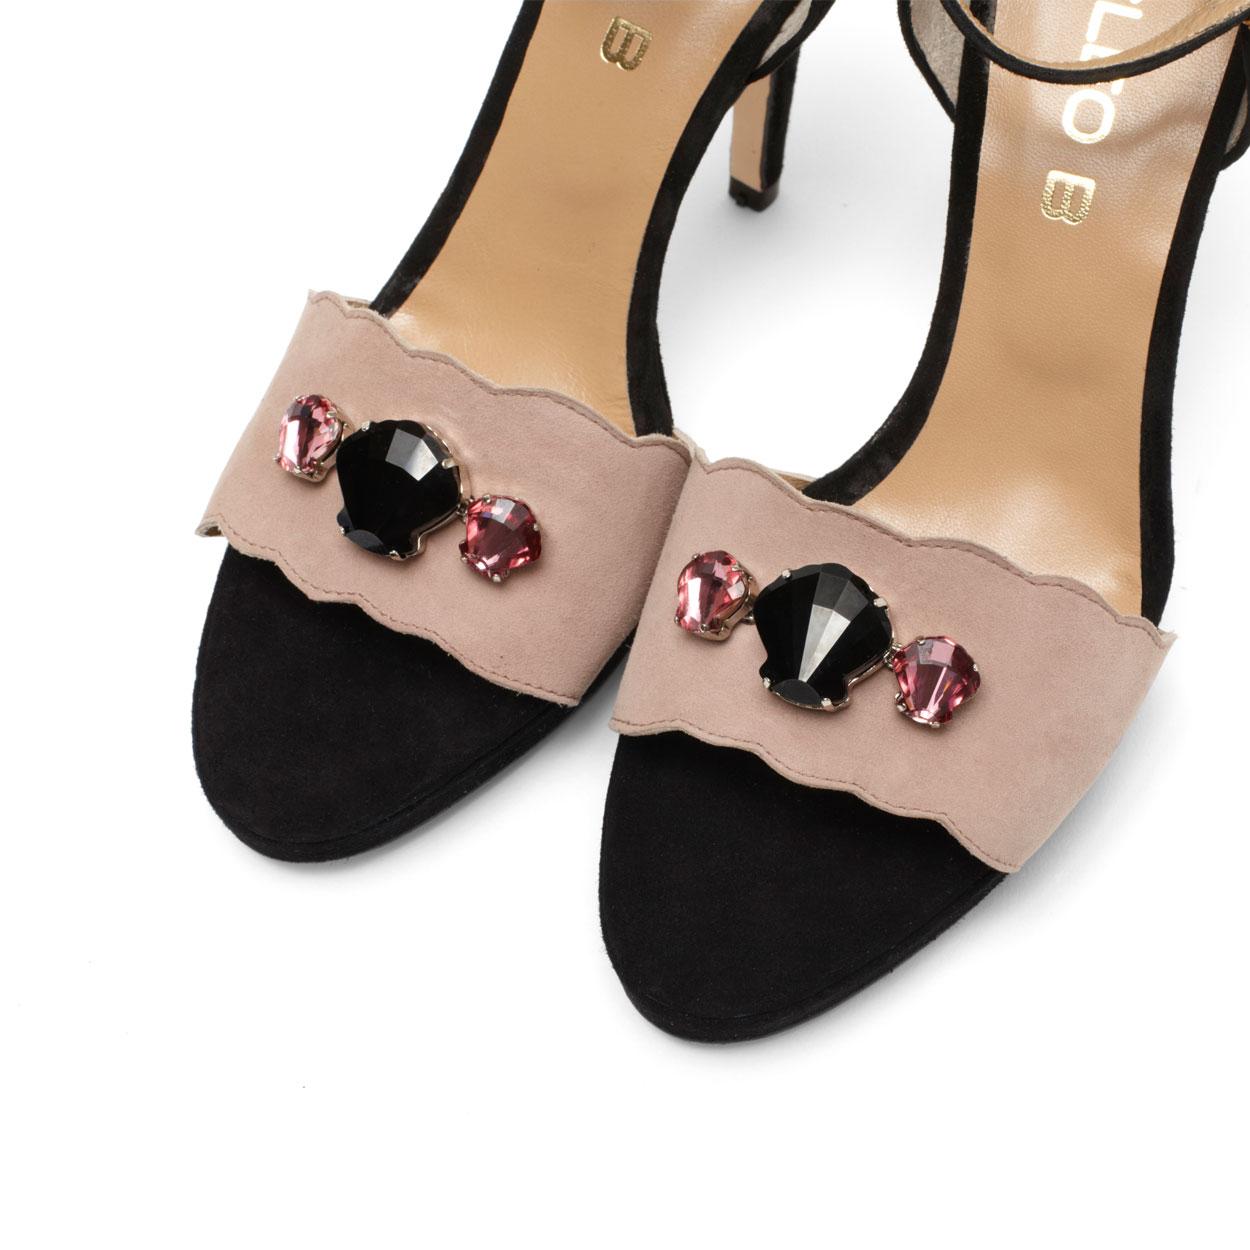 pepper-black-nude-toe-shoes-shoe-design-designer-cleob-london-shopping.jpg